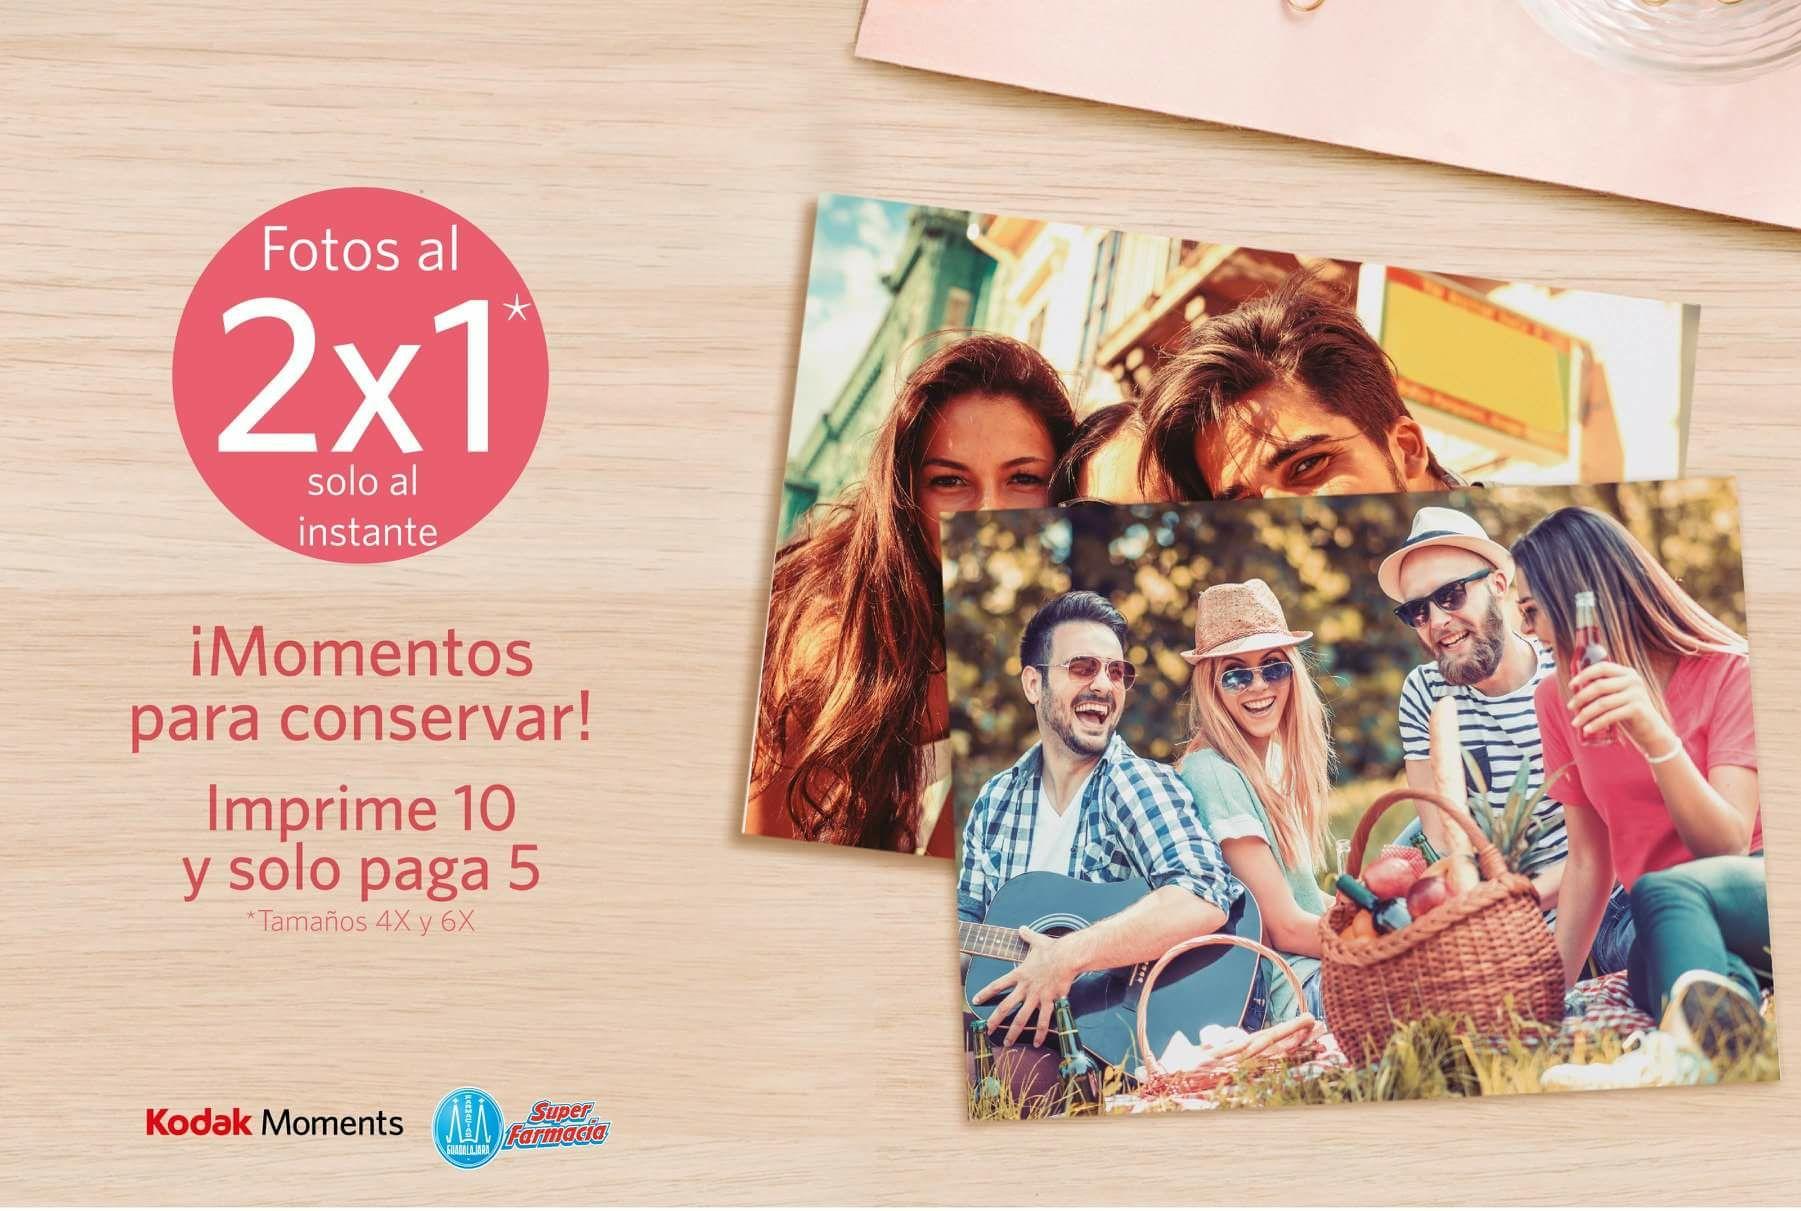 Farmacias Guadalajara - Kodak: 2x1 impresión fotos digitales